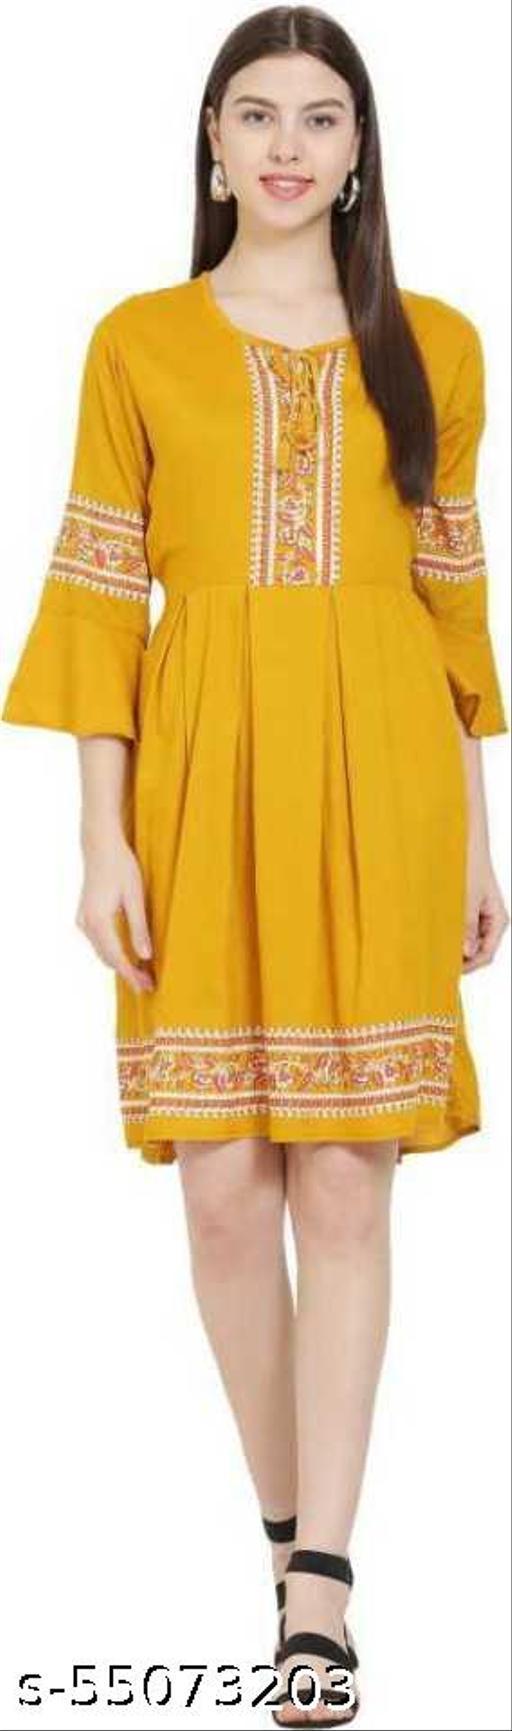 Alexa India Women / Girls Fit & Flare A Line Yellow Dress